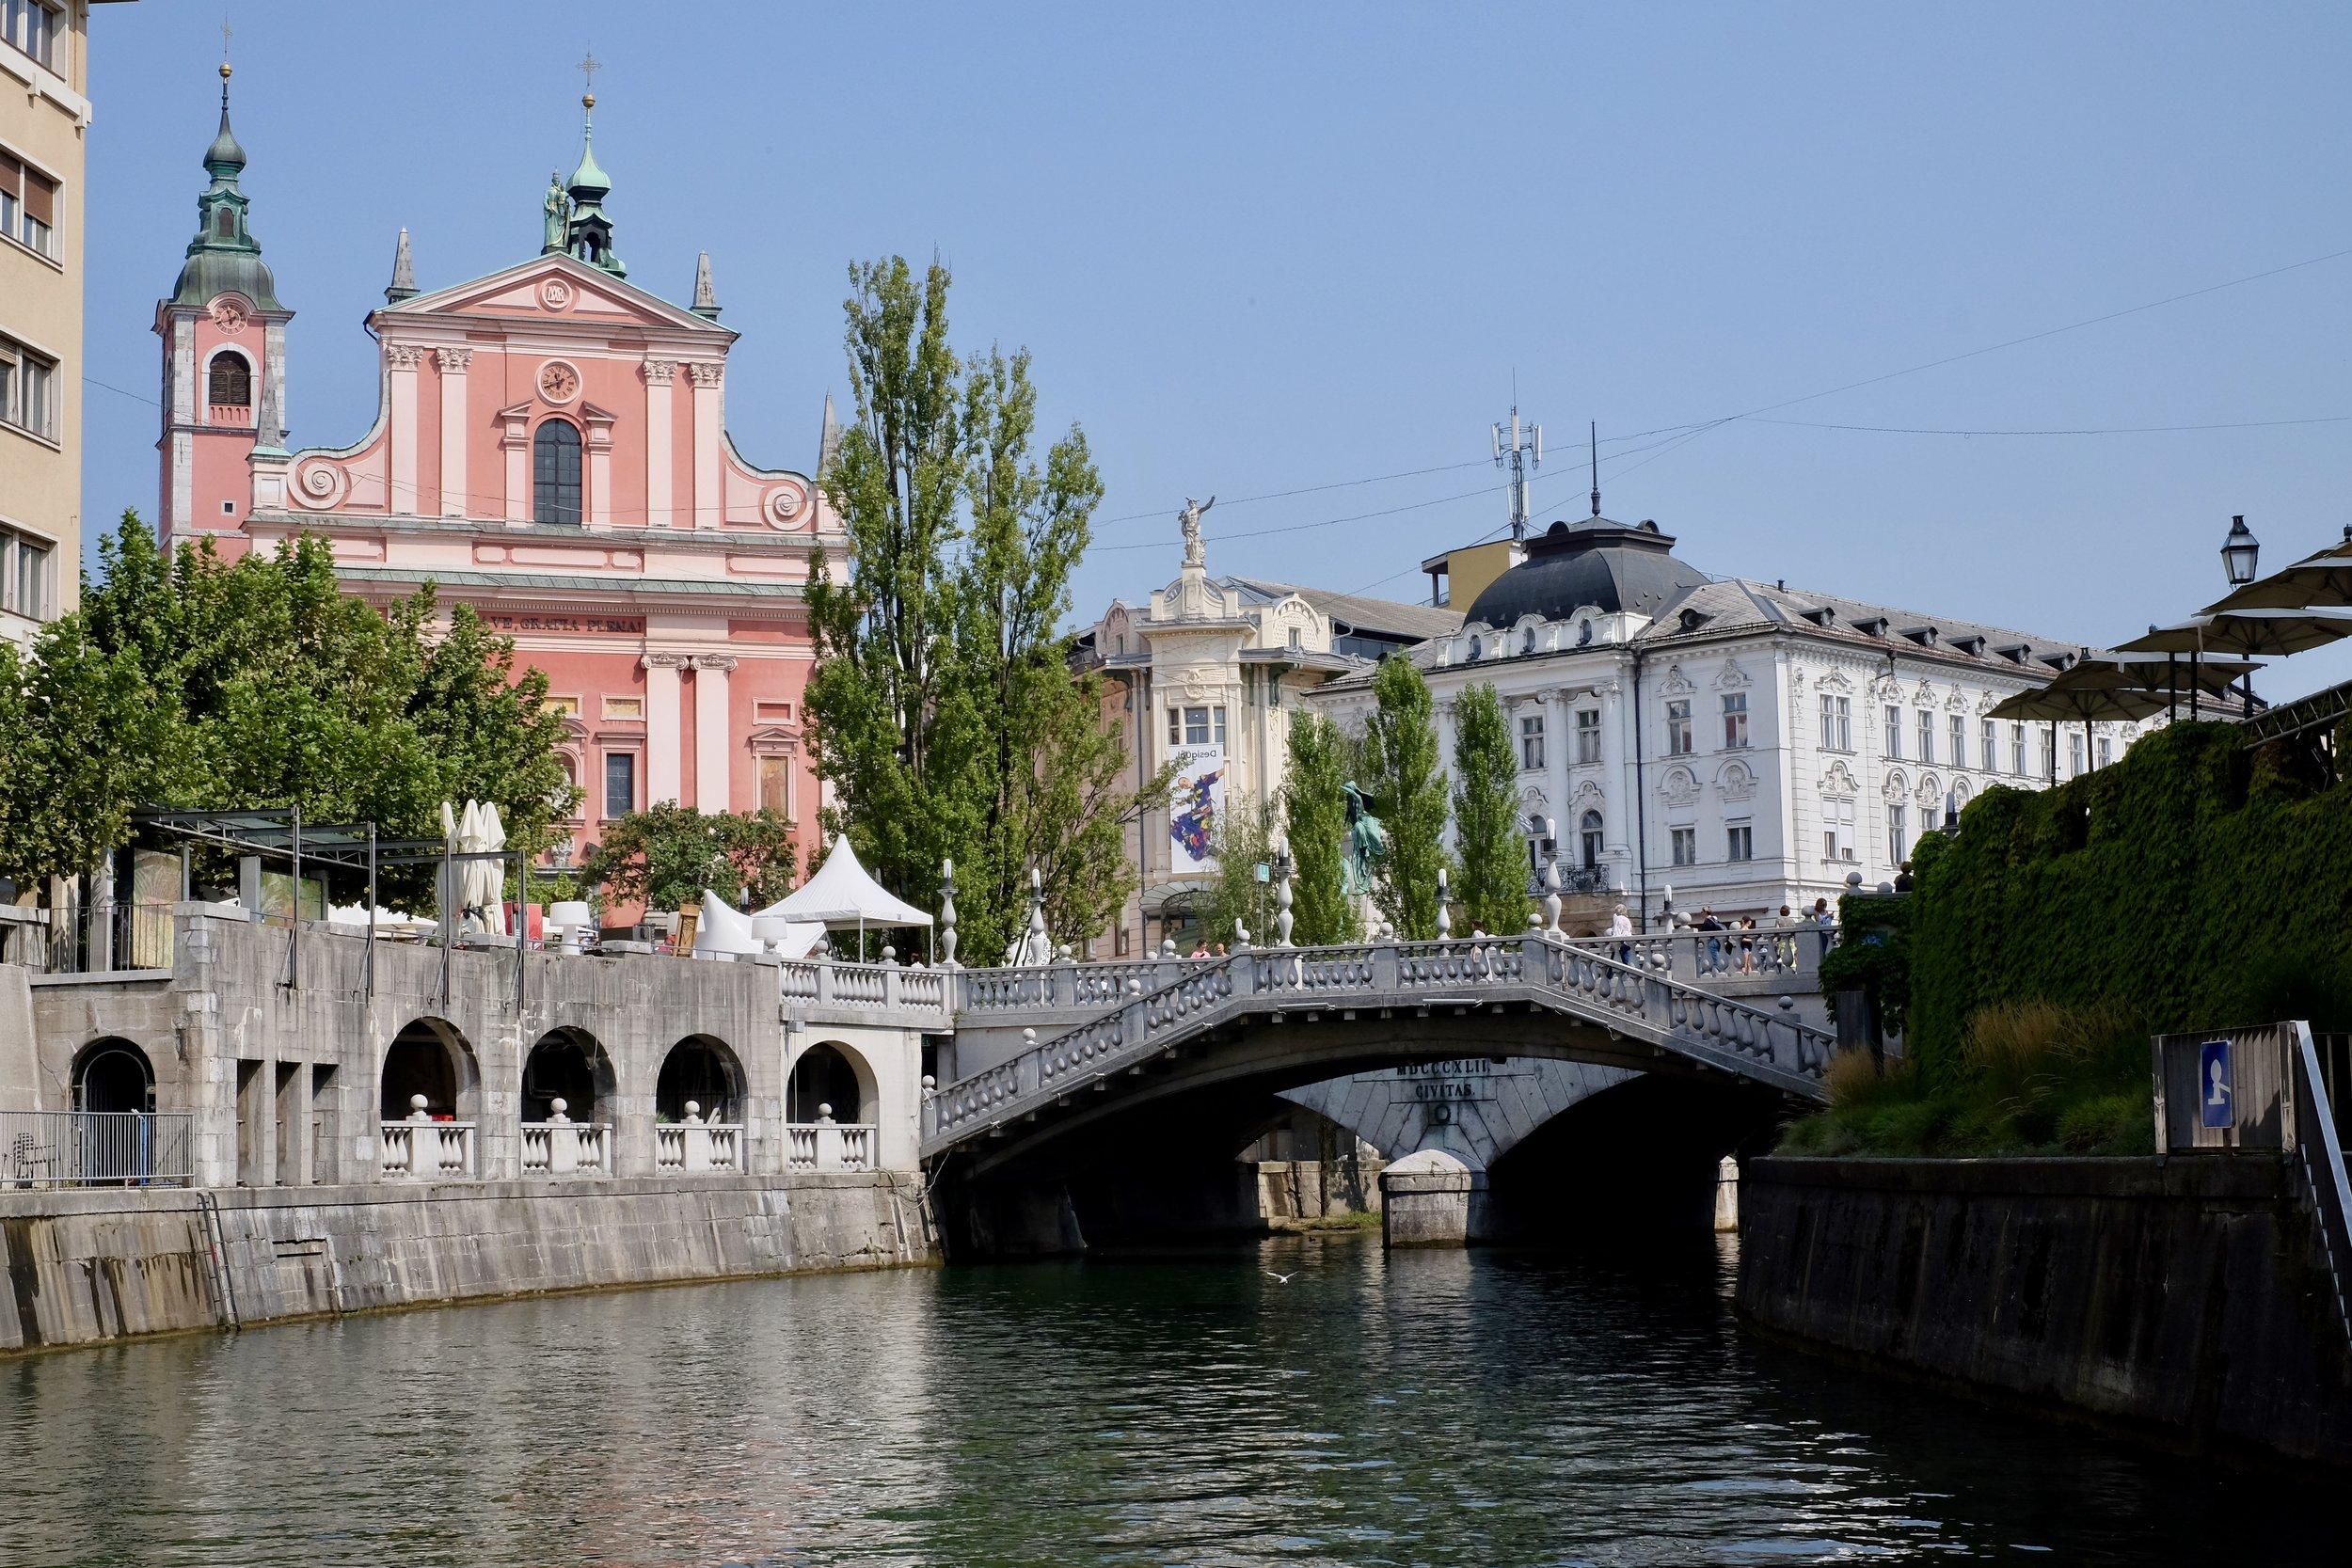 Floden Ljubljanica